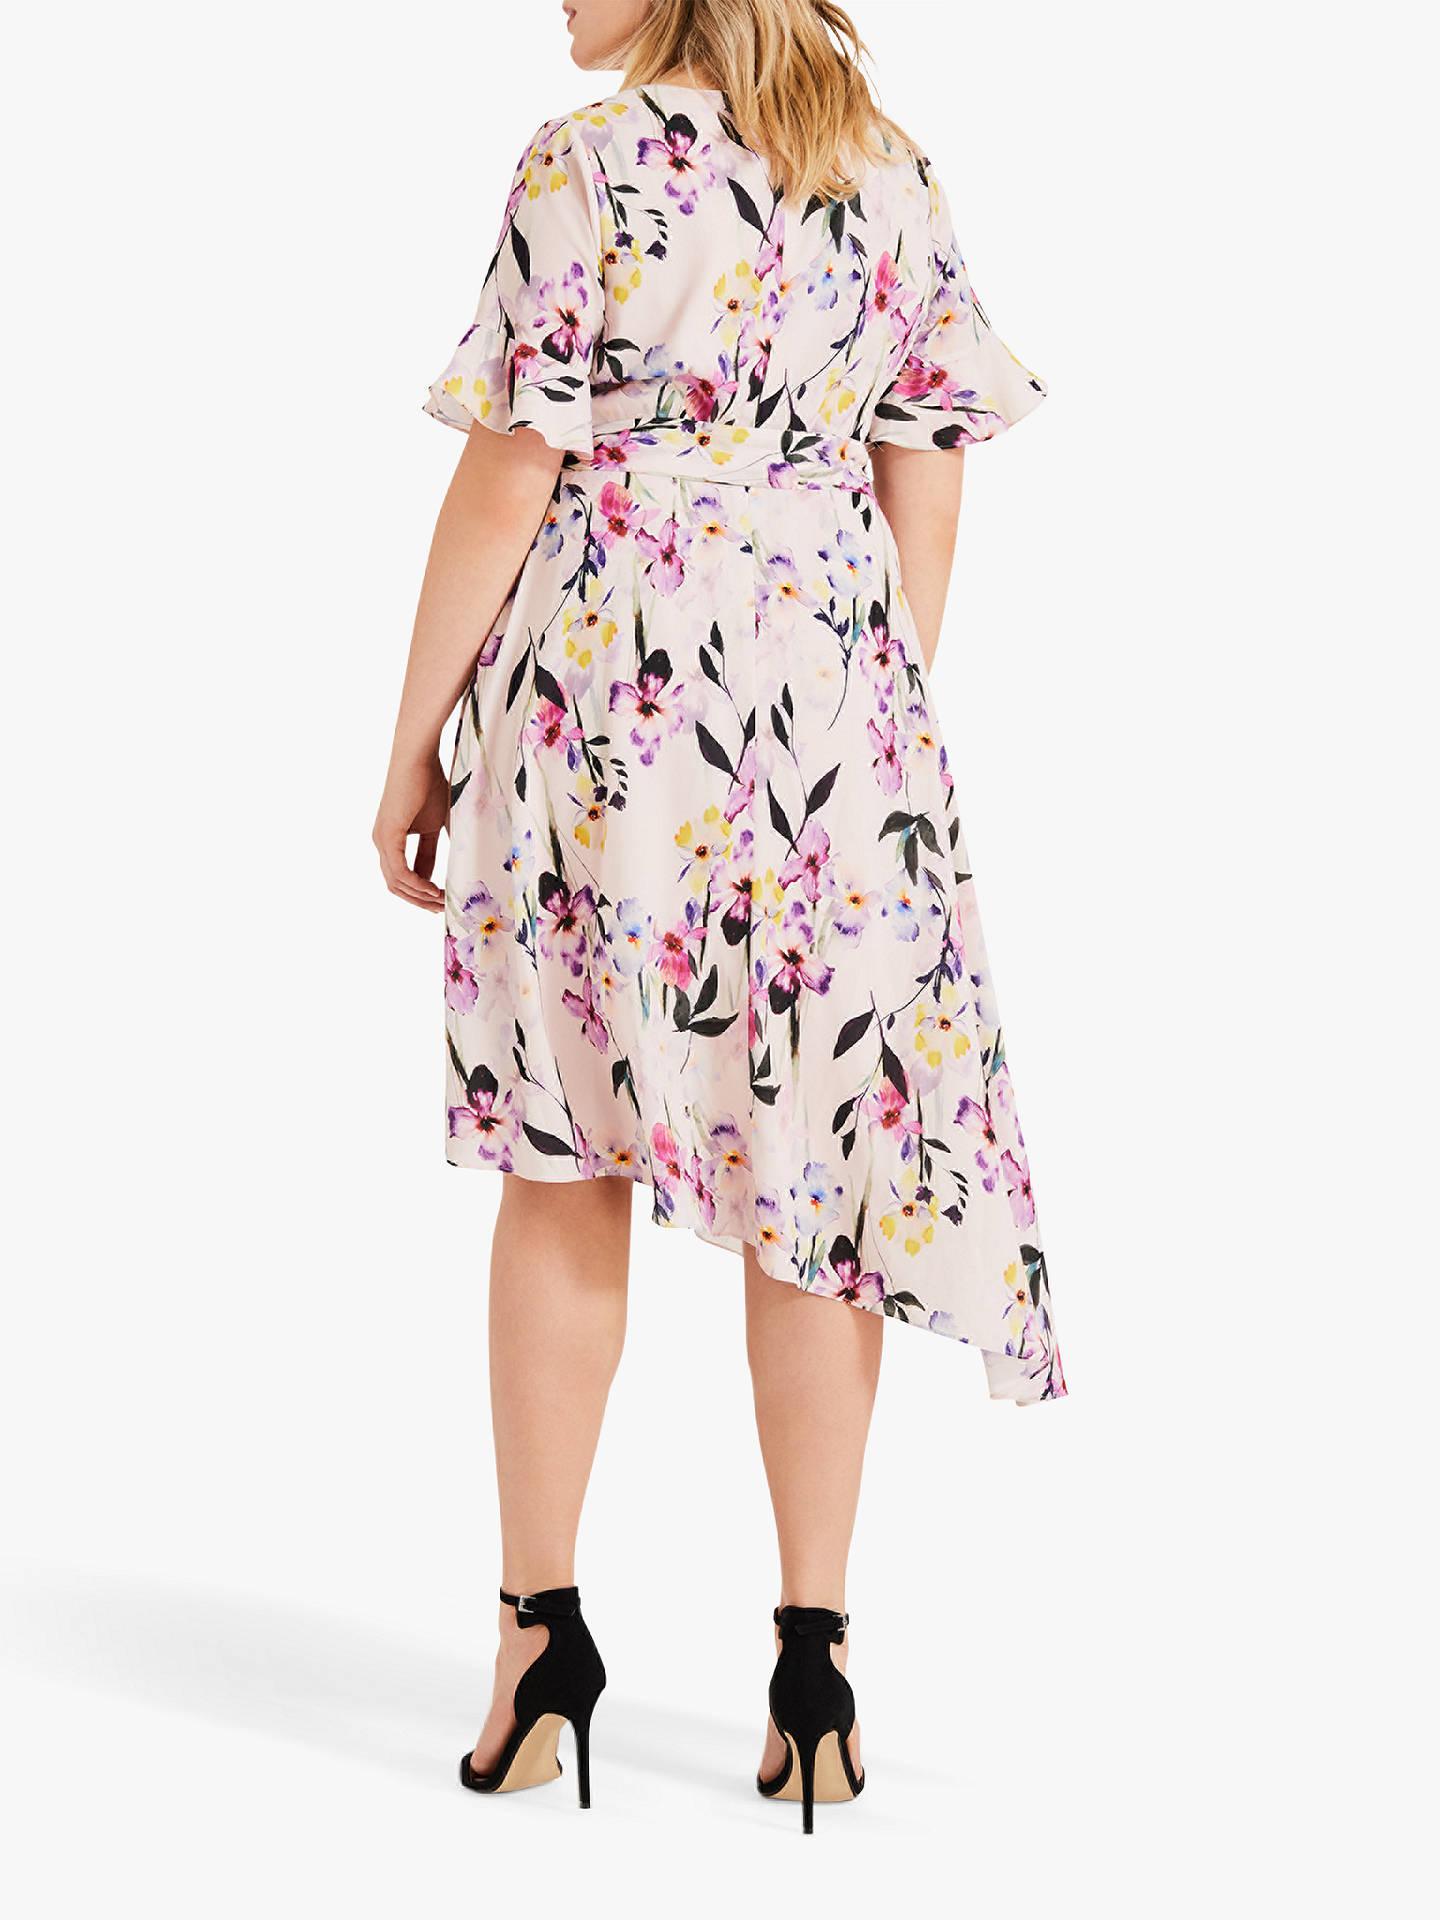 040a3665441d0 ... Buy Studio 8 Calie Floral Print Asymmetric Midi Dress, Pink/Multi, 14  Online ...